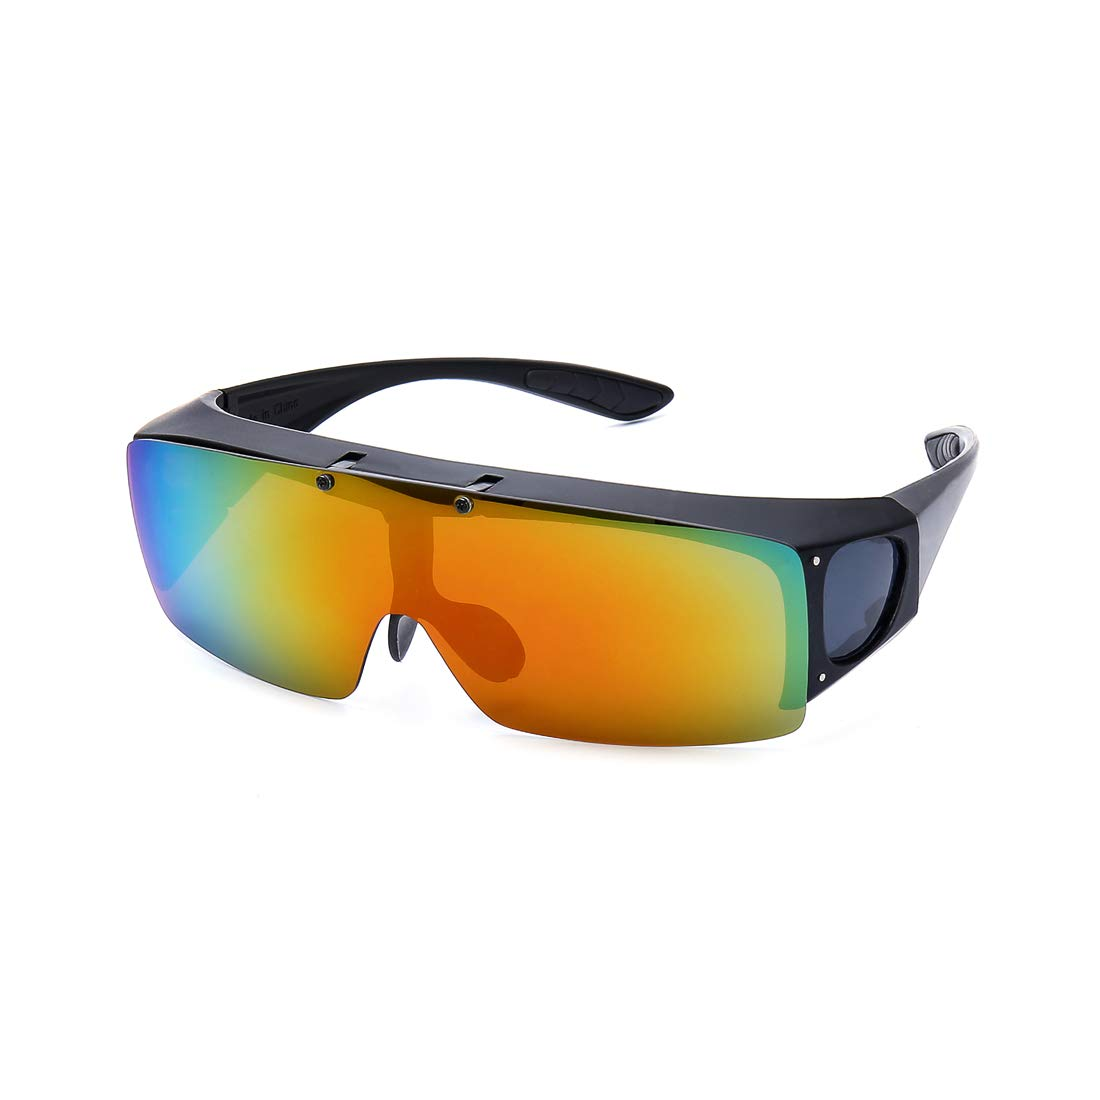 FLIP UP Polarized Sunglasses Driving Glasses UV400 Fitover Sunglasses for men and women (Red, 5.8)